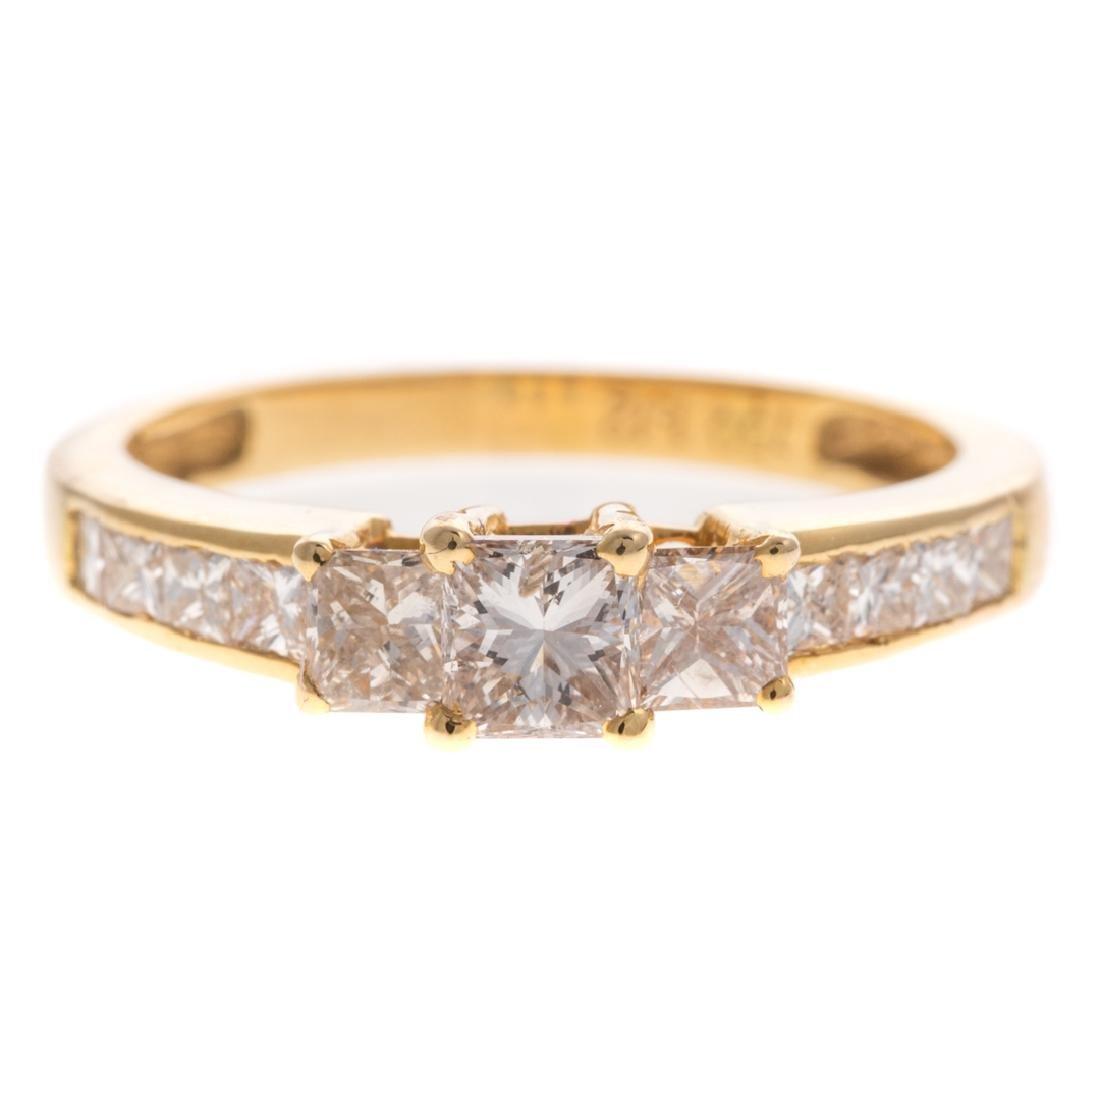 A Lady's Princess Cut Diamond Ring in 18K Gold